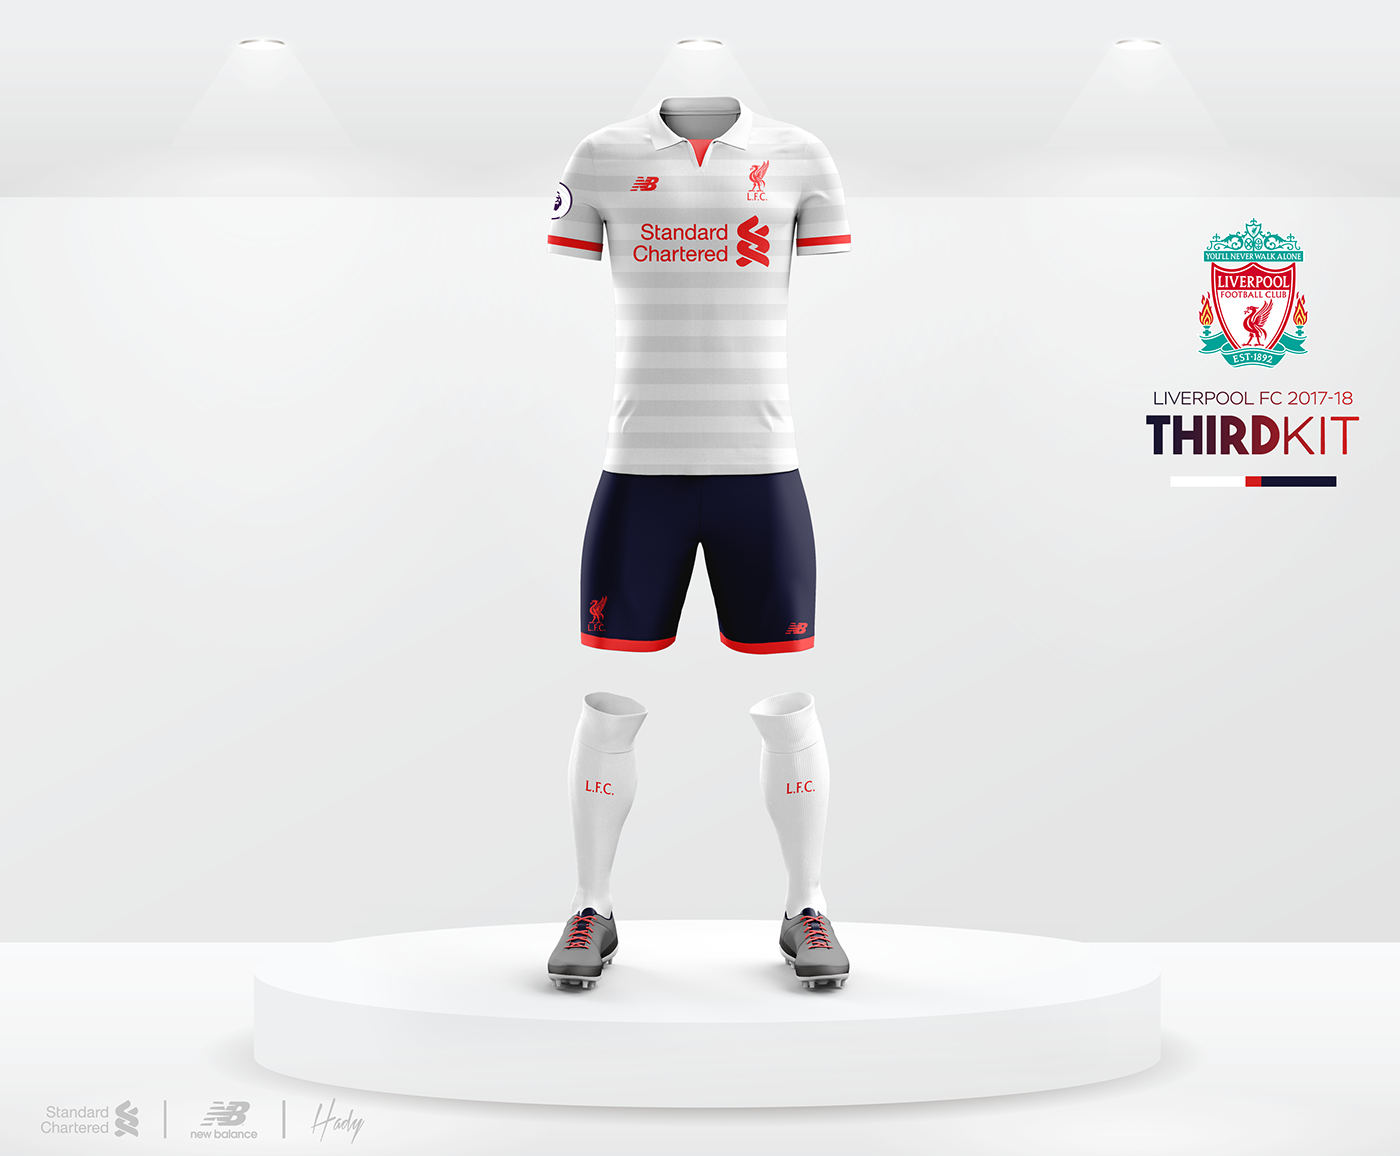 3740050ba Liverpool FC 2017-18 Kits Concept. on Behance